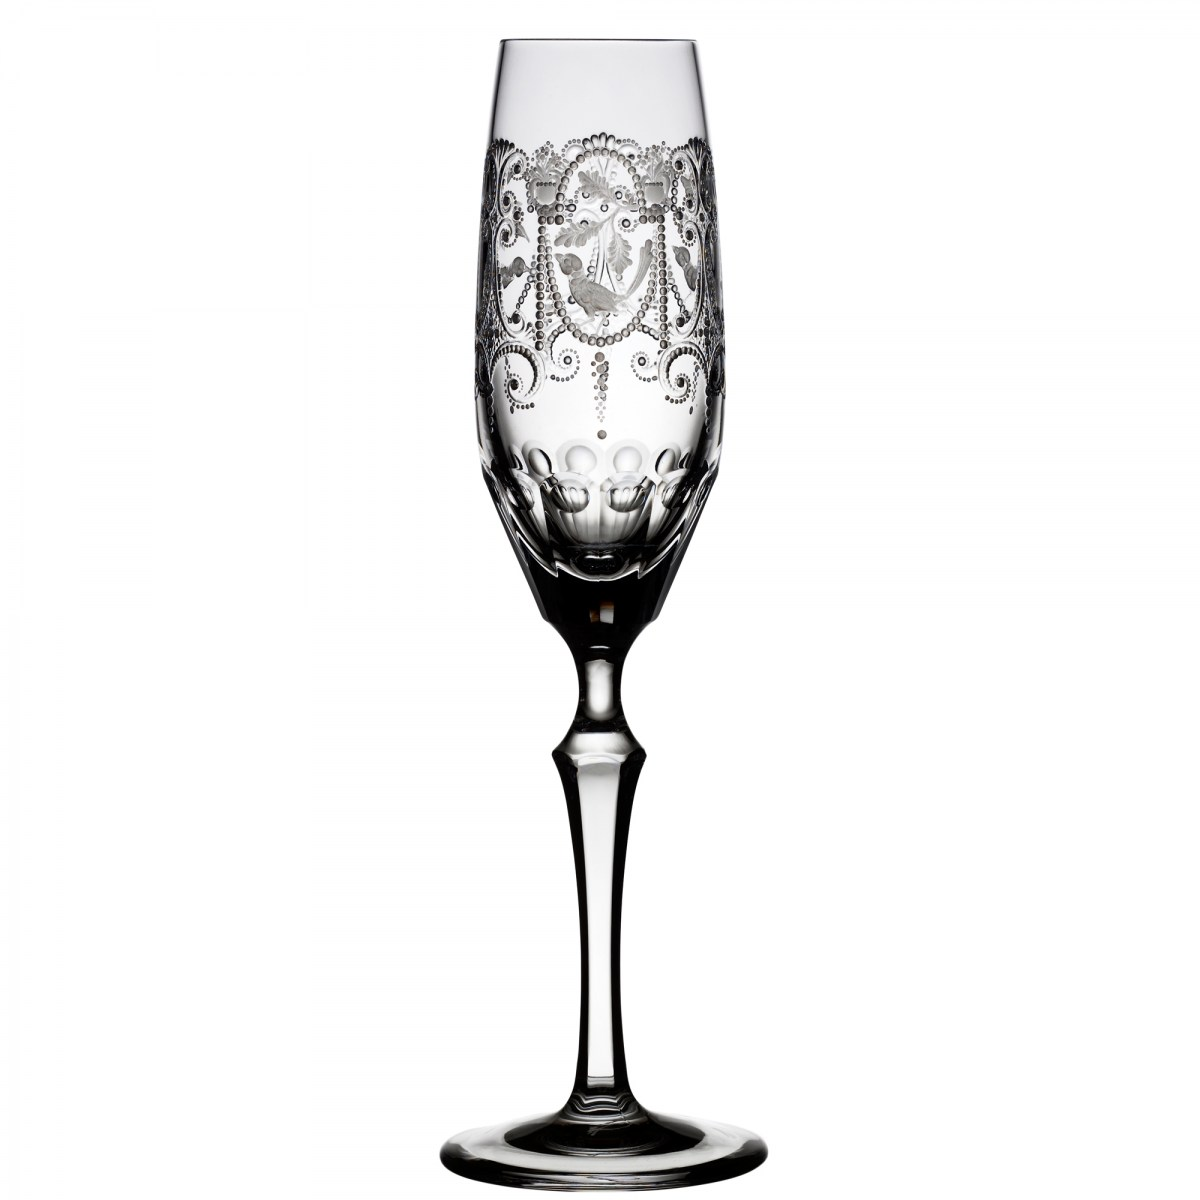 Madeira Clear Flute - $ 257 / € 225